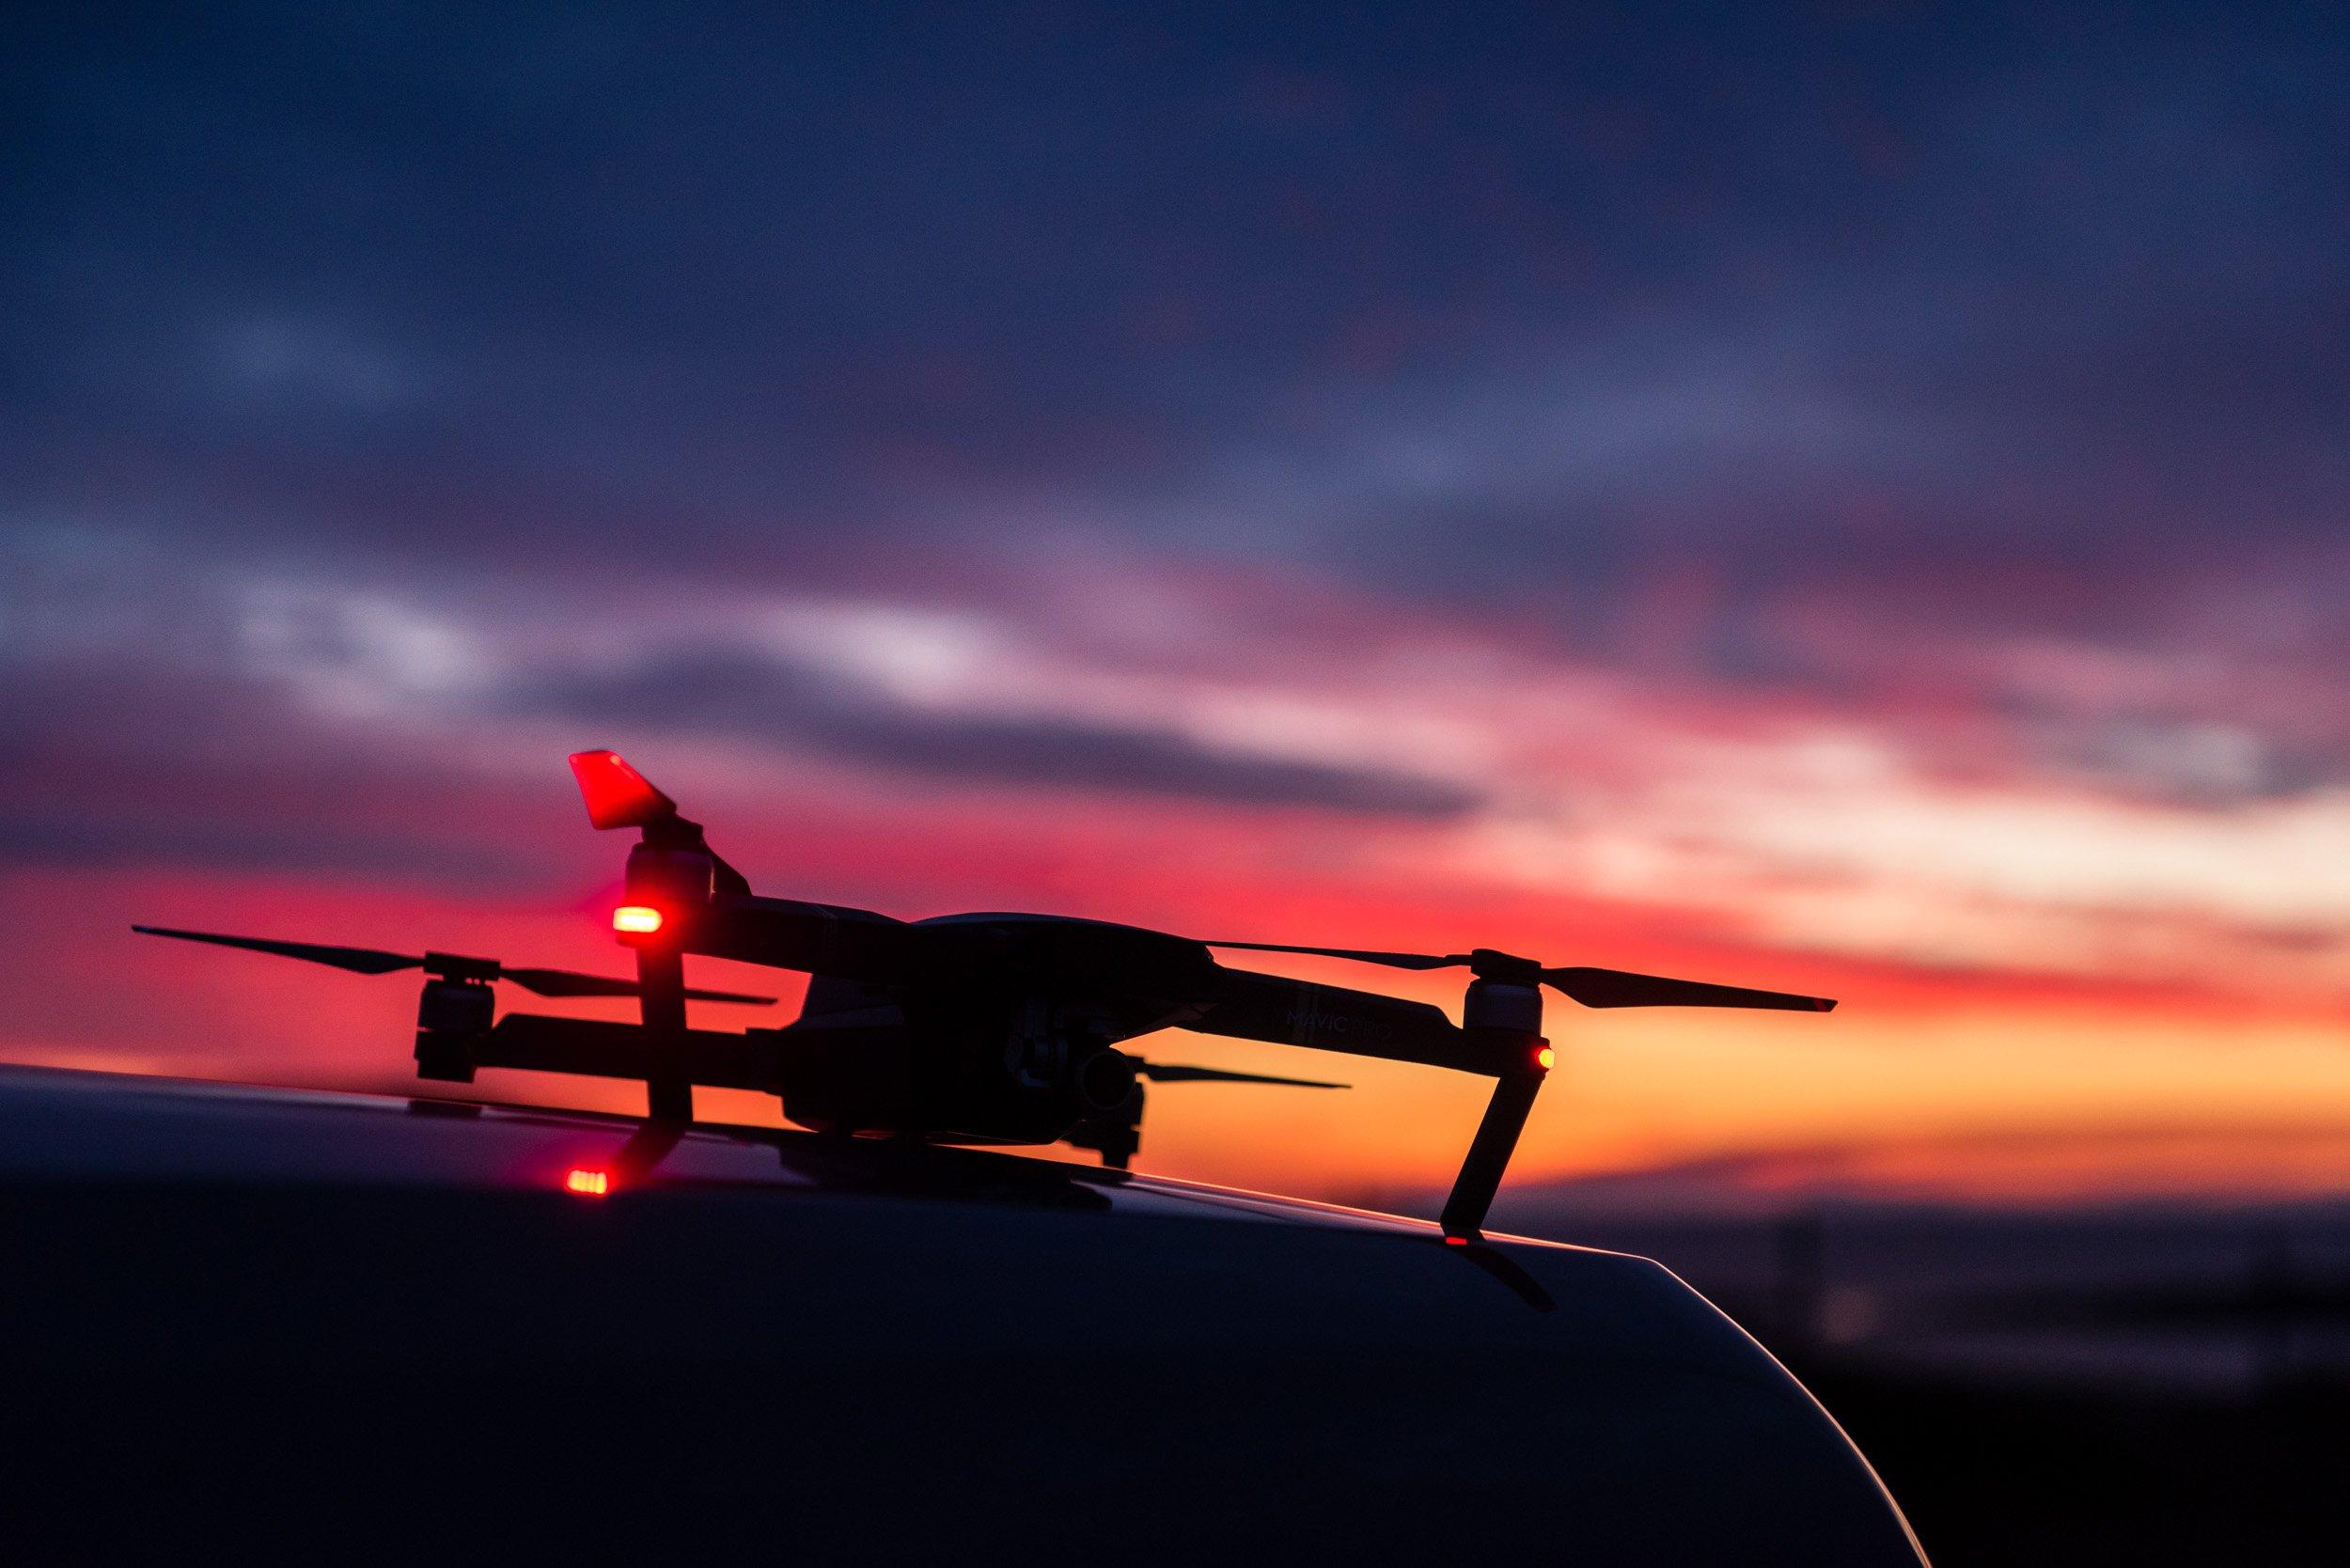 Drone pilot and cameraman Robert Hollingworth